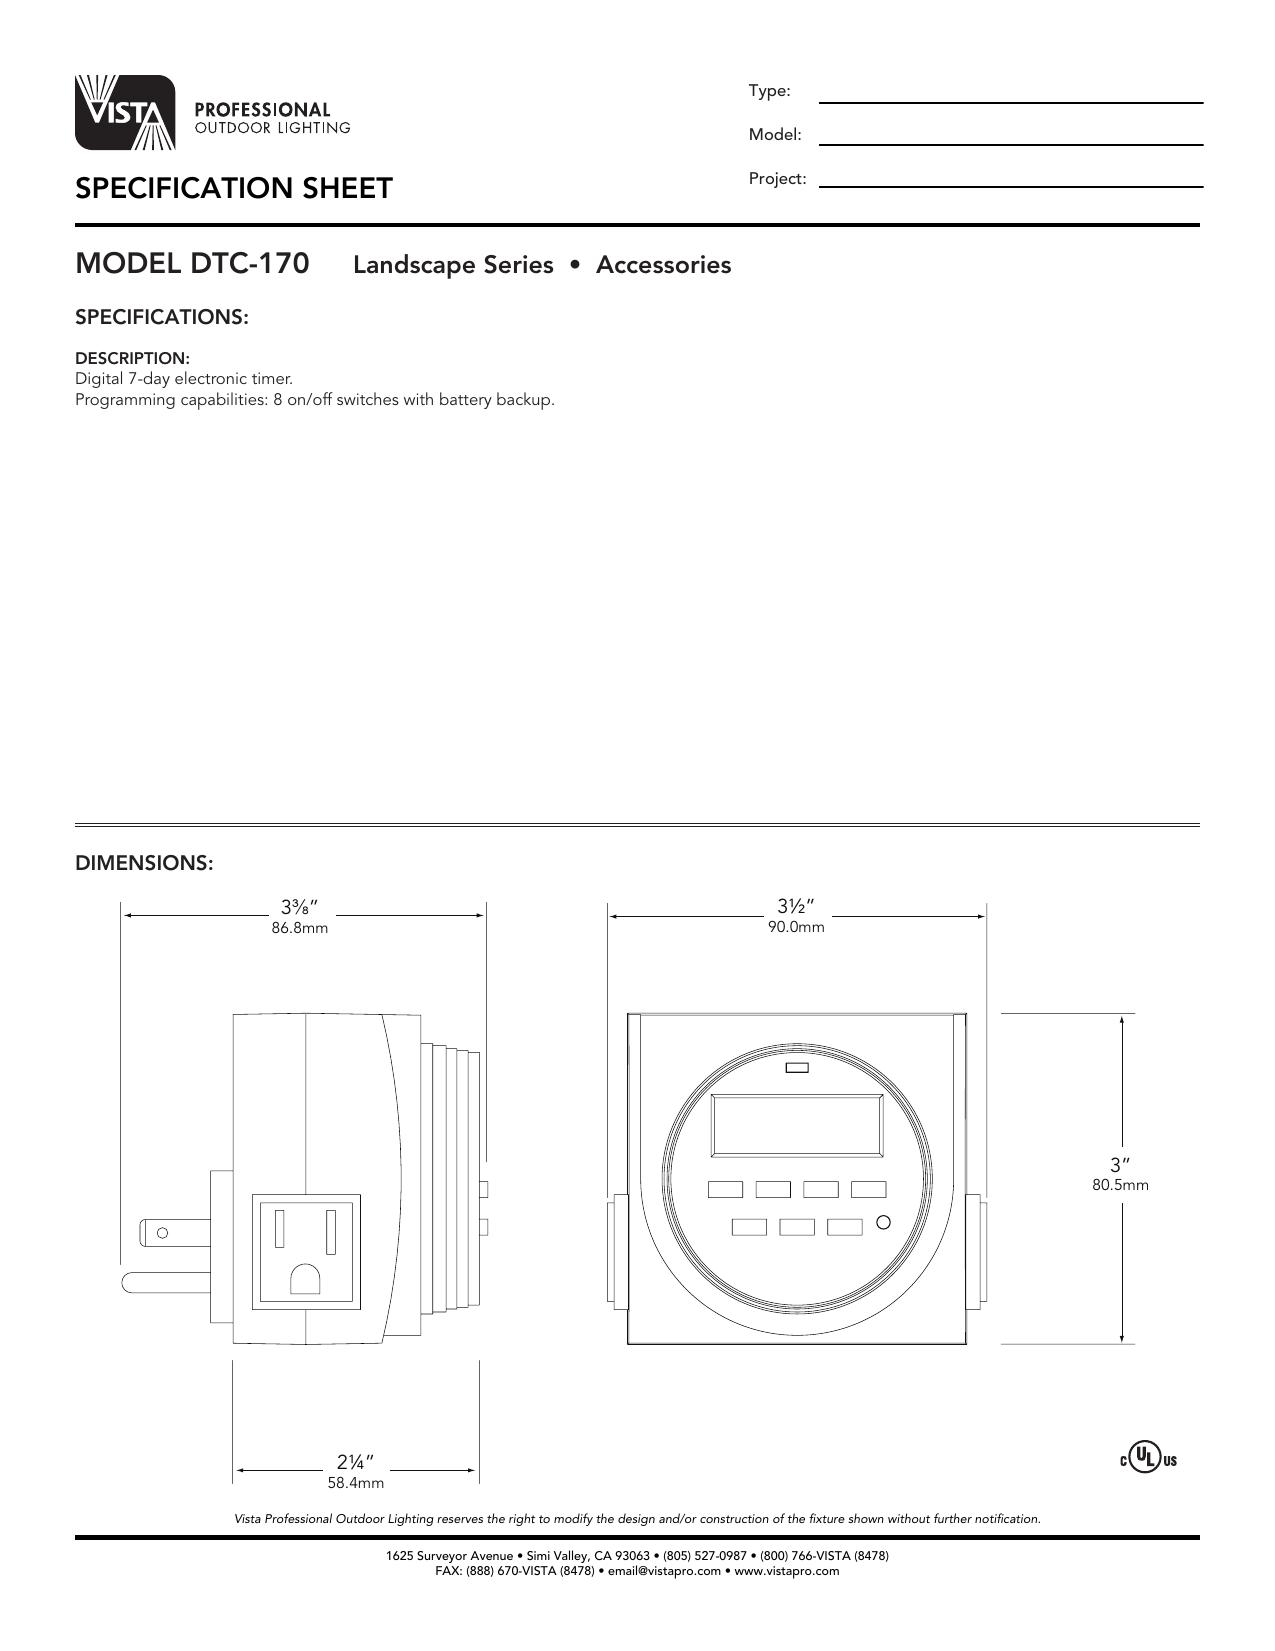 Specification Sheet Vista Professional Outdoor Lighting